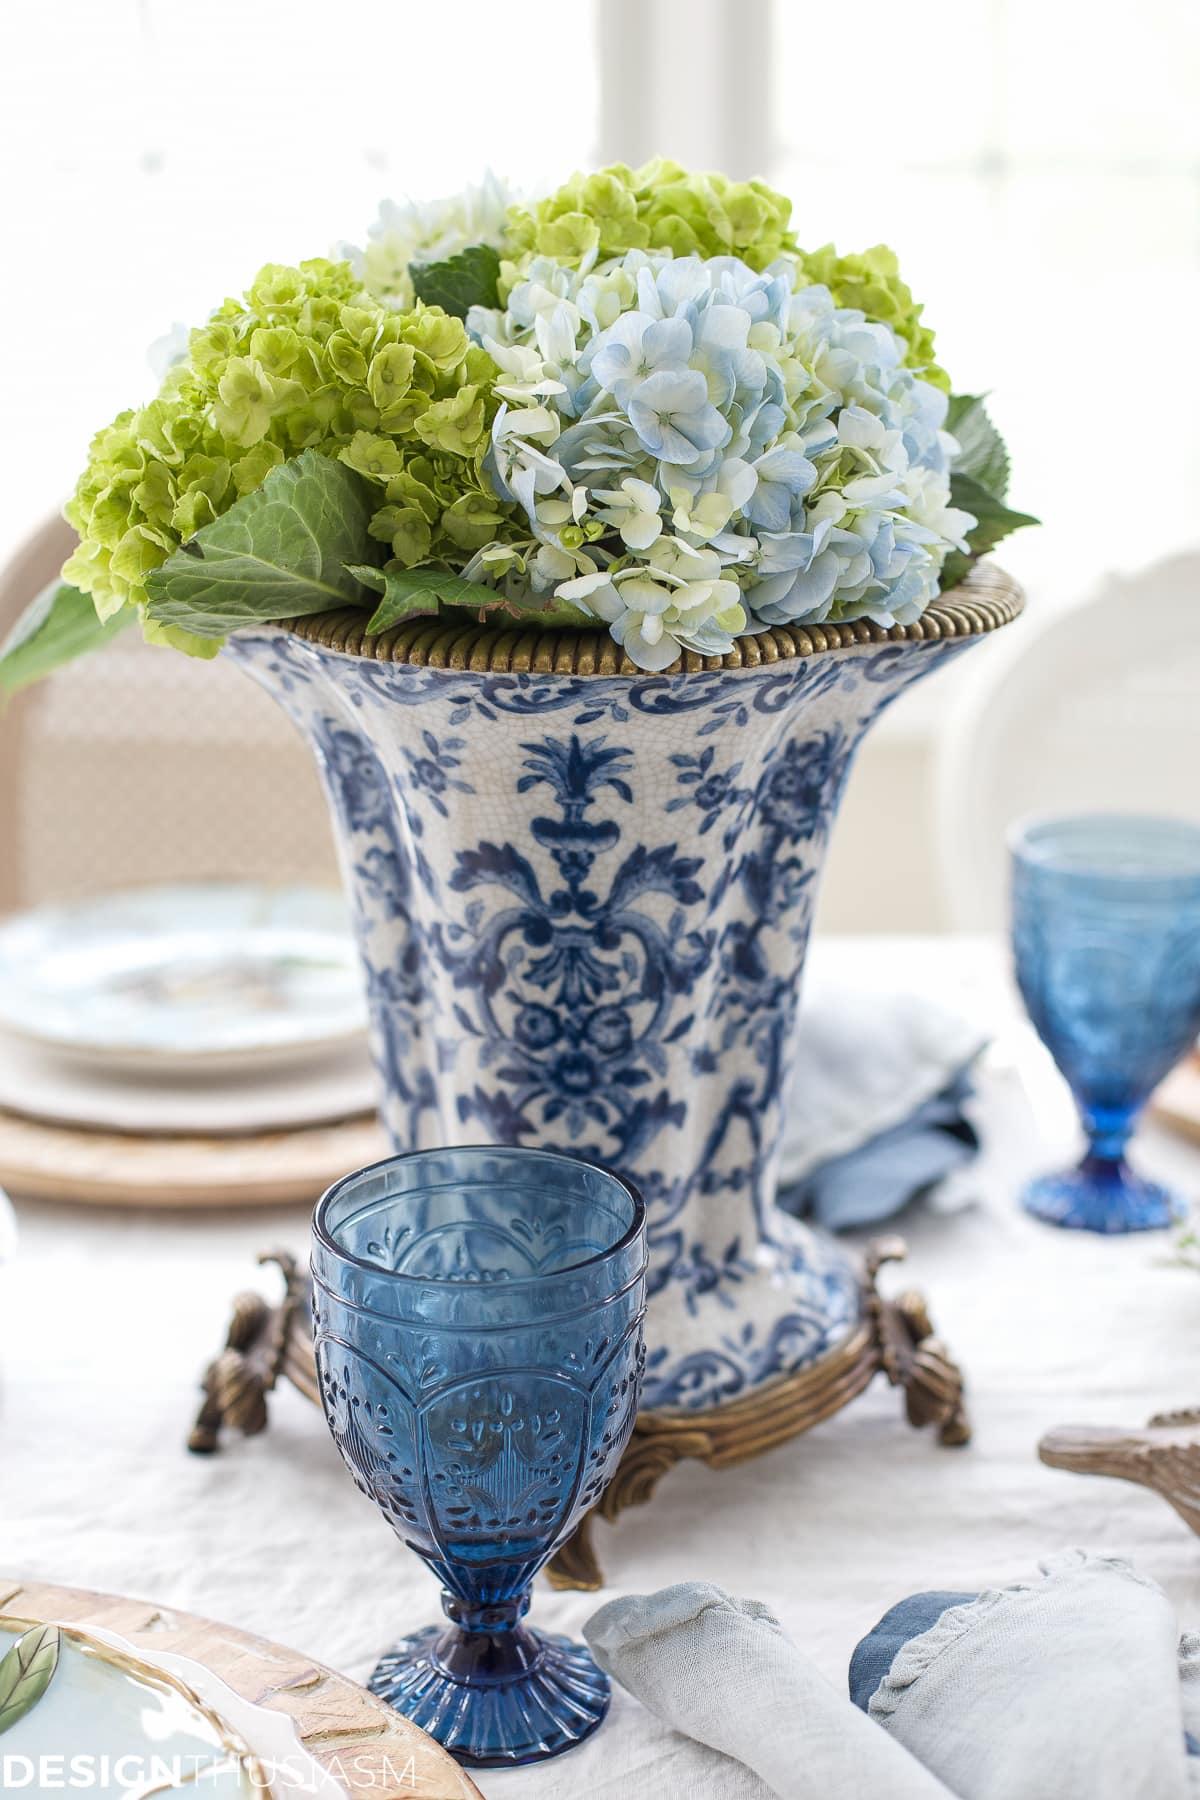 Elegant Easter table decorations for a holiday brunch | designthusiasm.com